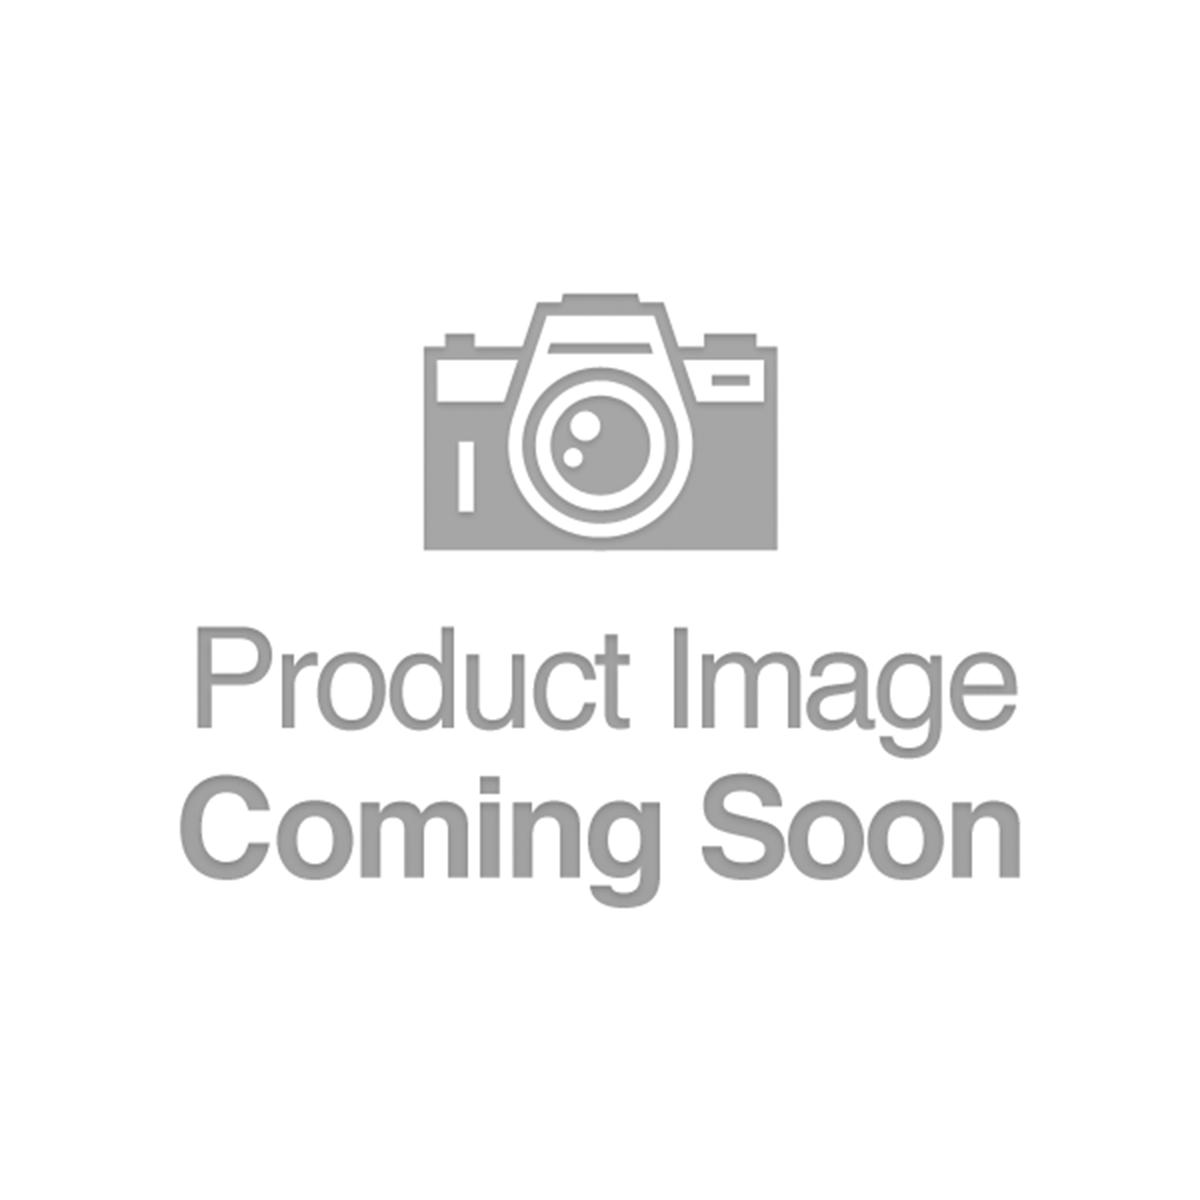 FR 247  $2  1896  Silver Certificate  PMG 65 EPQ